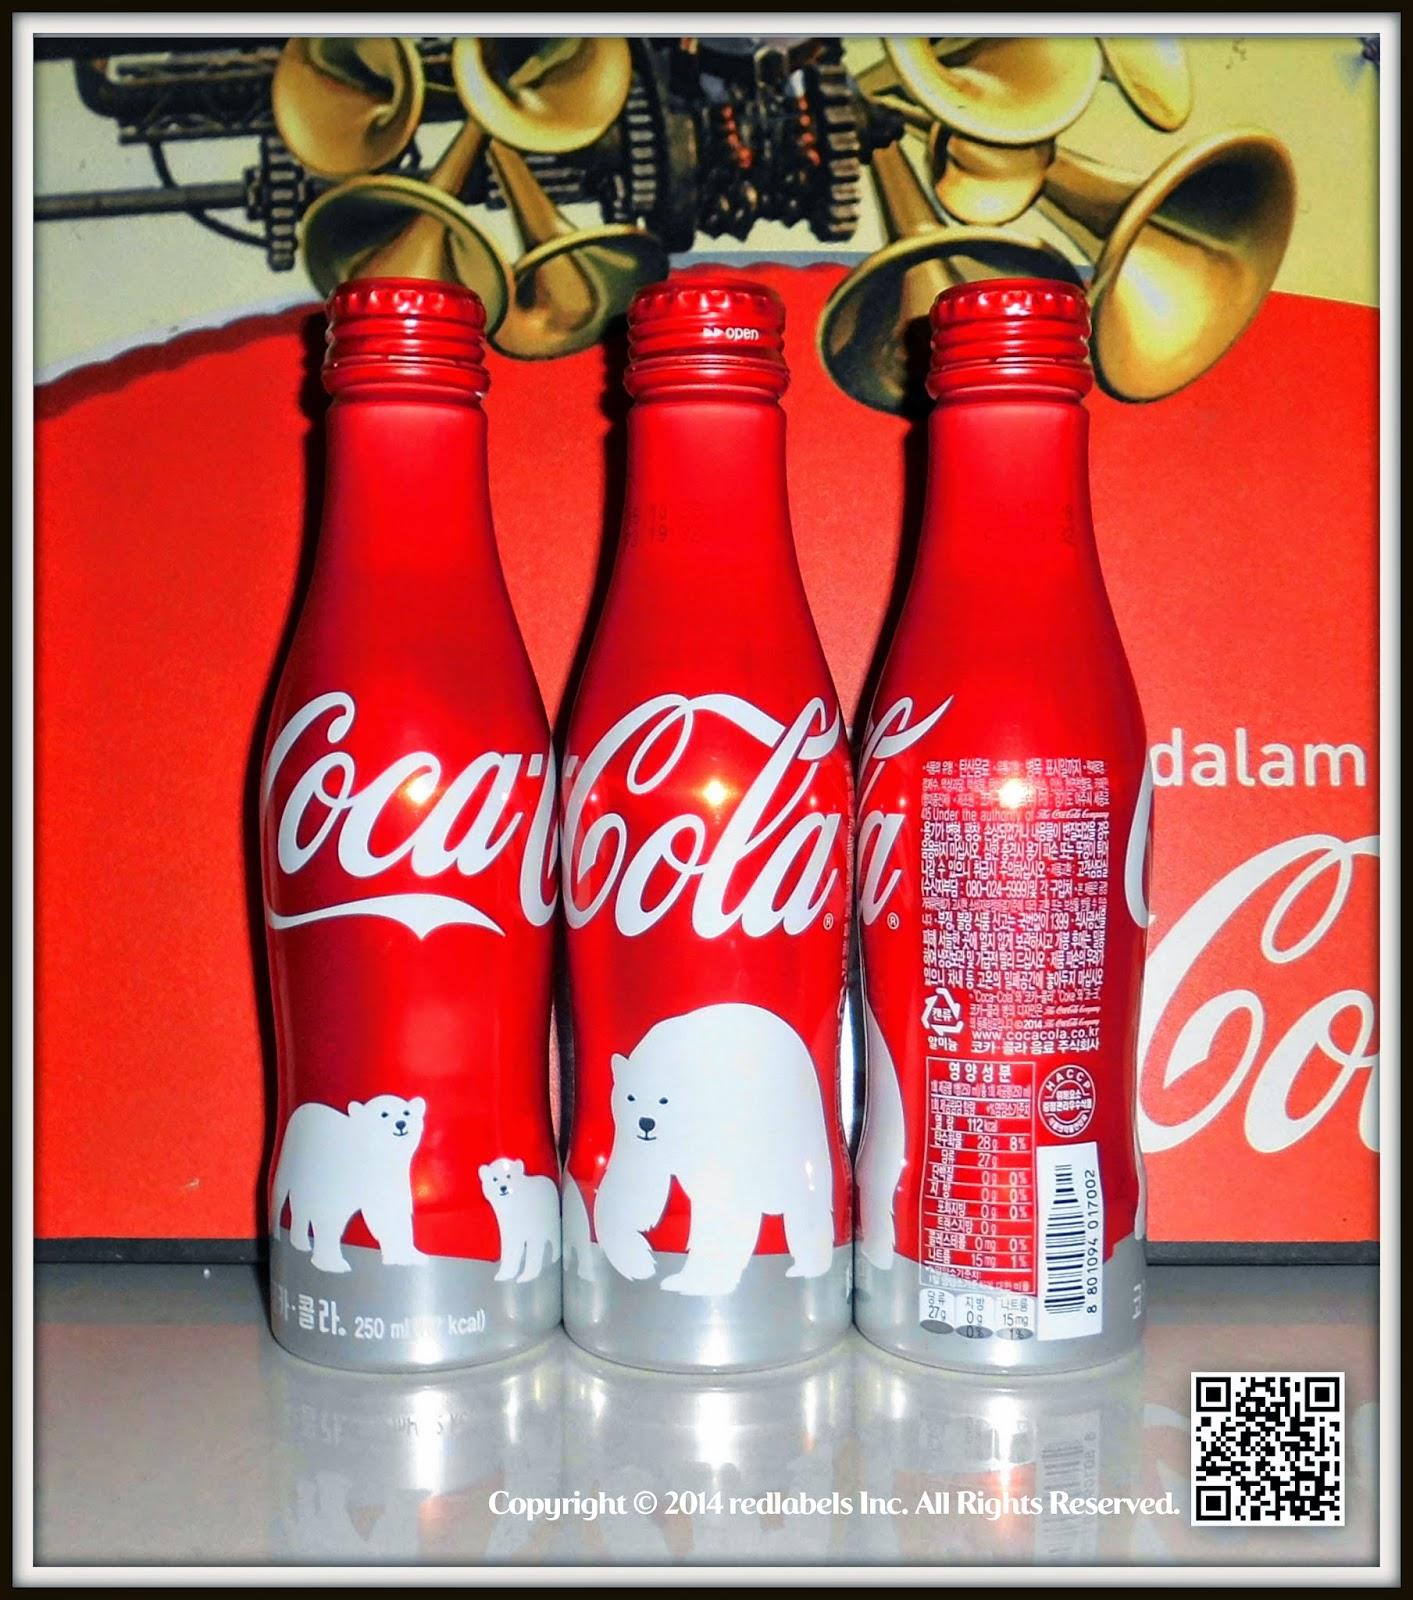 aluminum bottle collector club coca cola polar bears aluminum bottle limited edition korea 2014. Black Bedroom Furniture Sets. Home Design Ideas